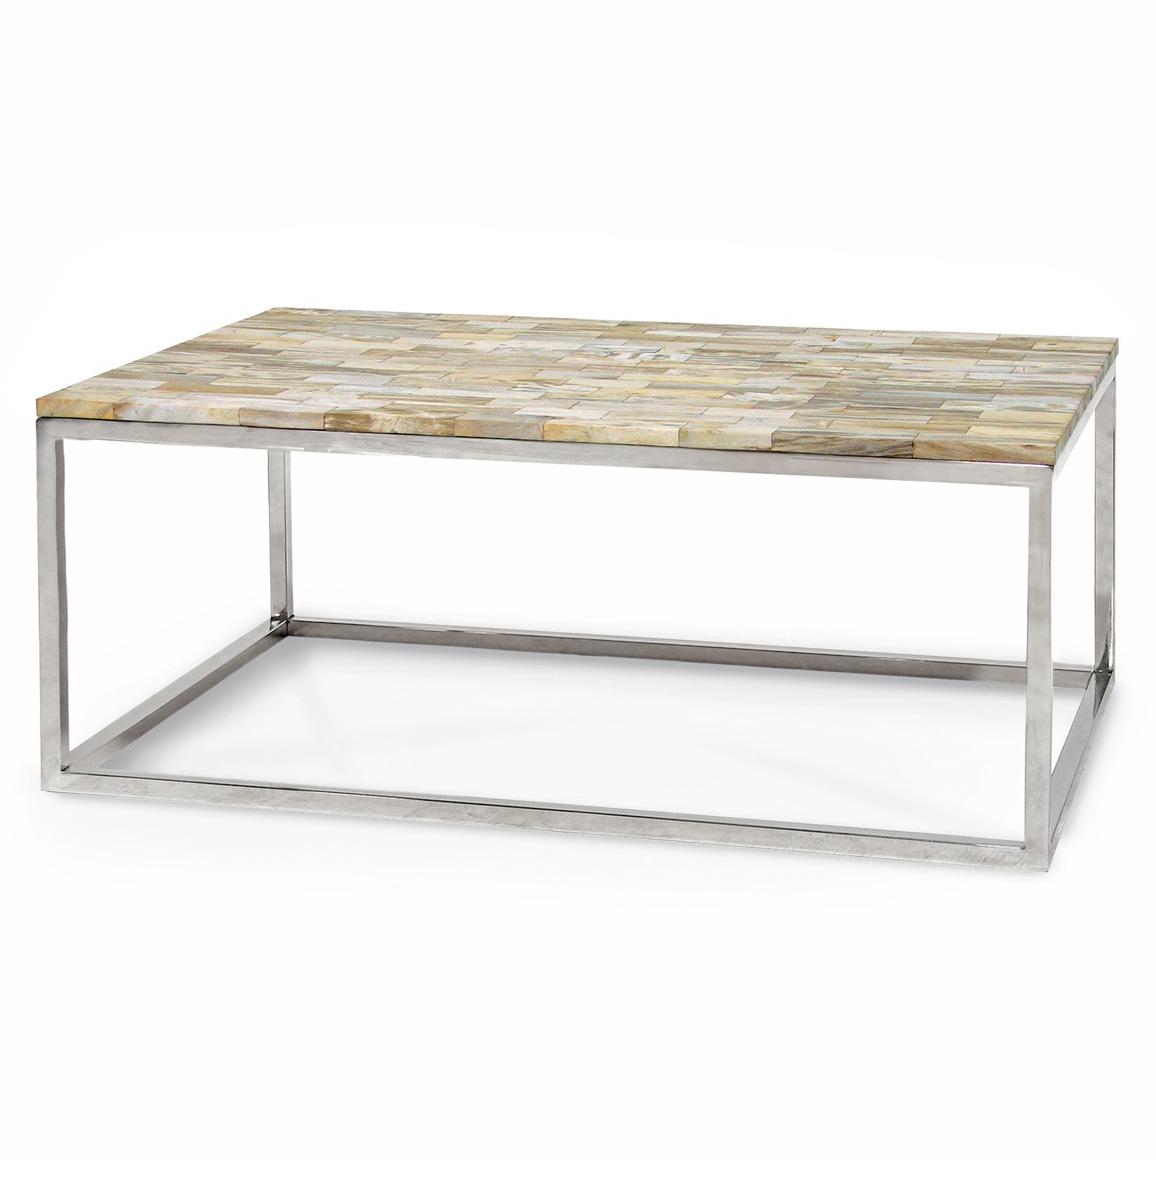 Lakota Industrial Loft Petrified Wood Cream Rectangular Coffee Table - 45.5 Inch